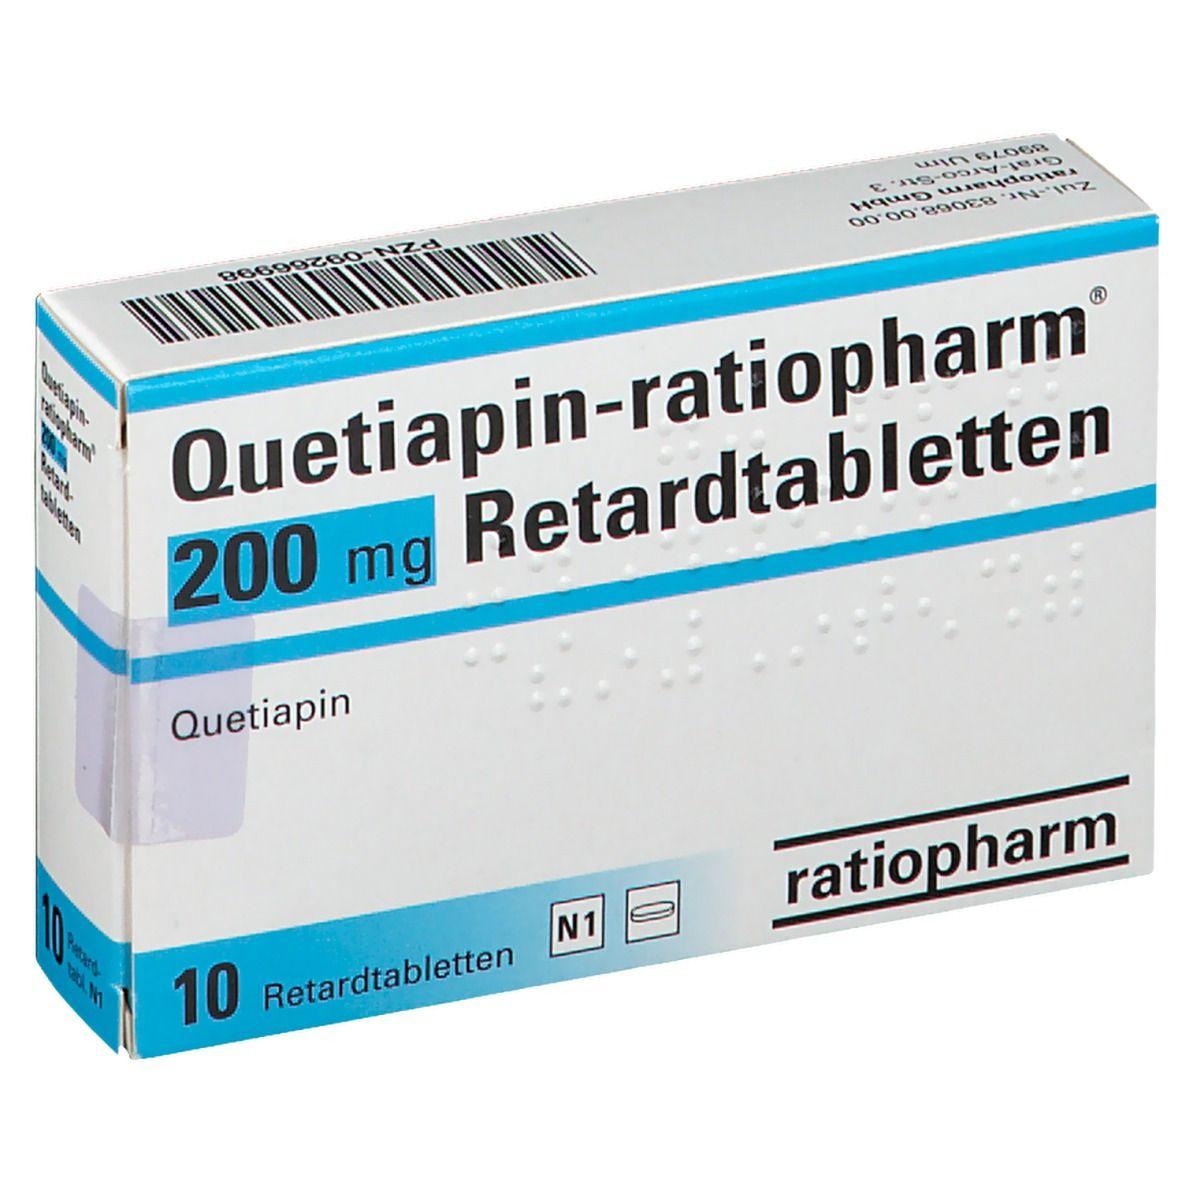 QUETIAPIN RATIO 200MG RET